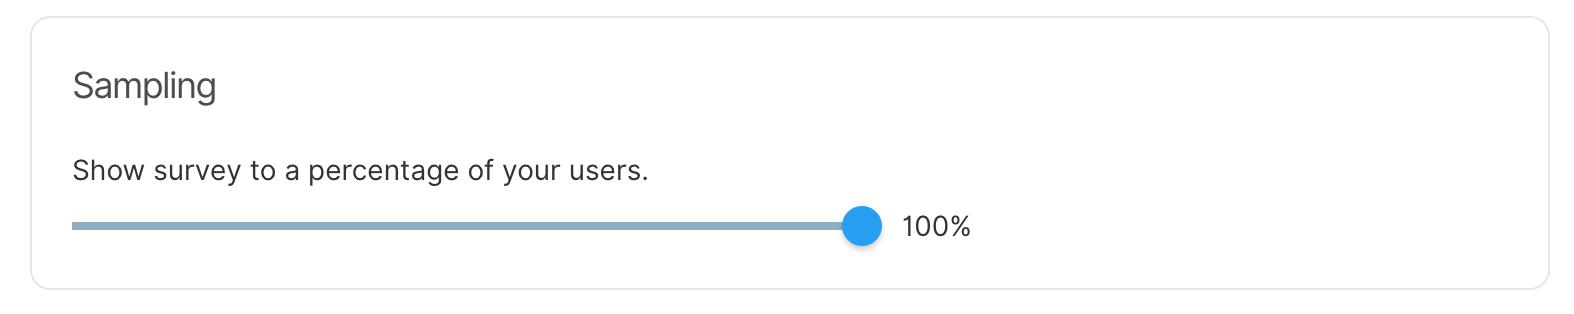 Sampling - Survey percentage of user base